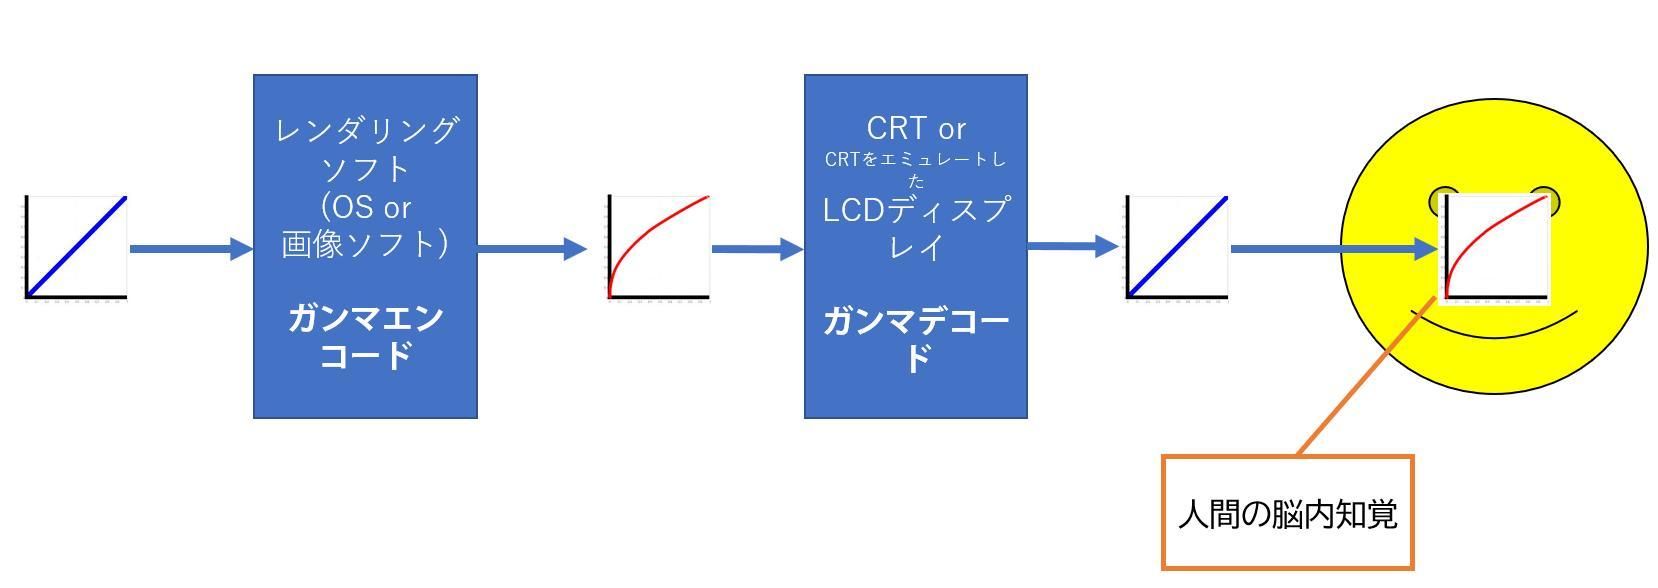 f:id:yasuo_ssi:20201106000646j:plain